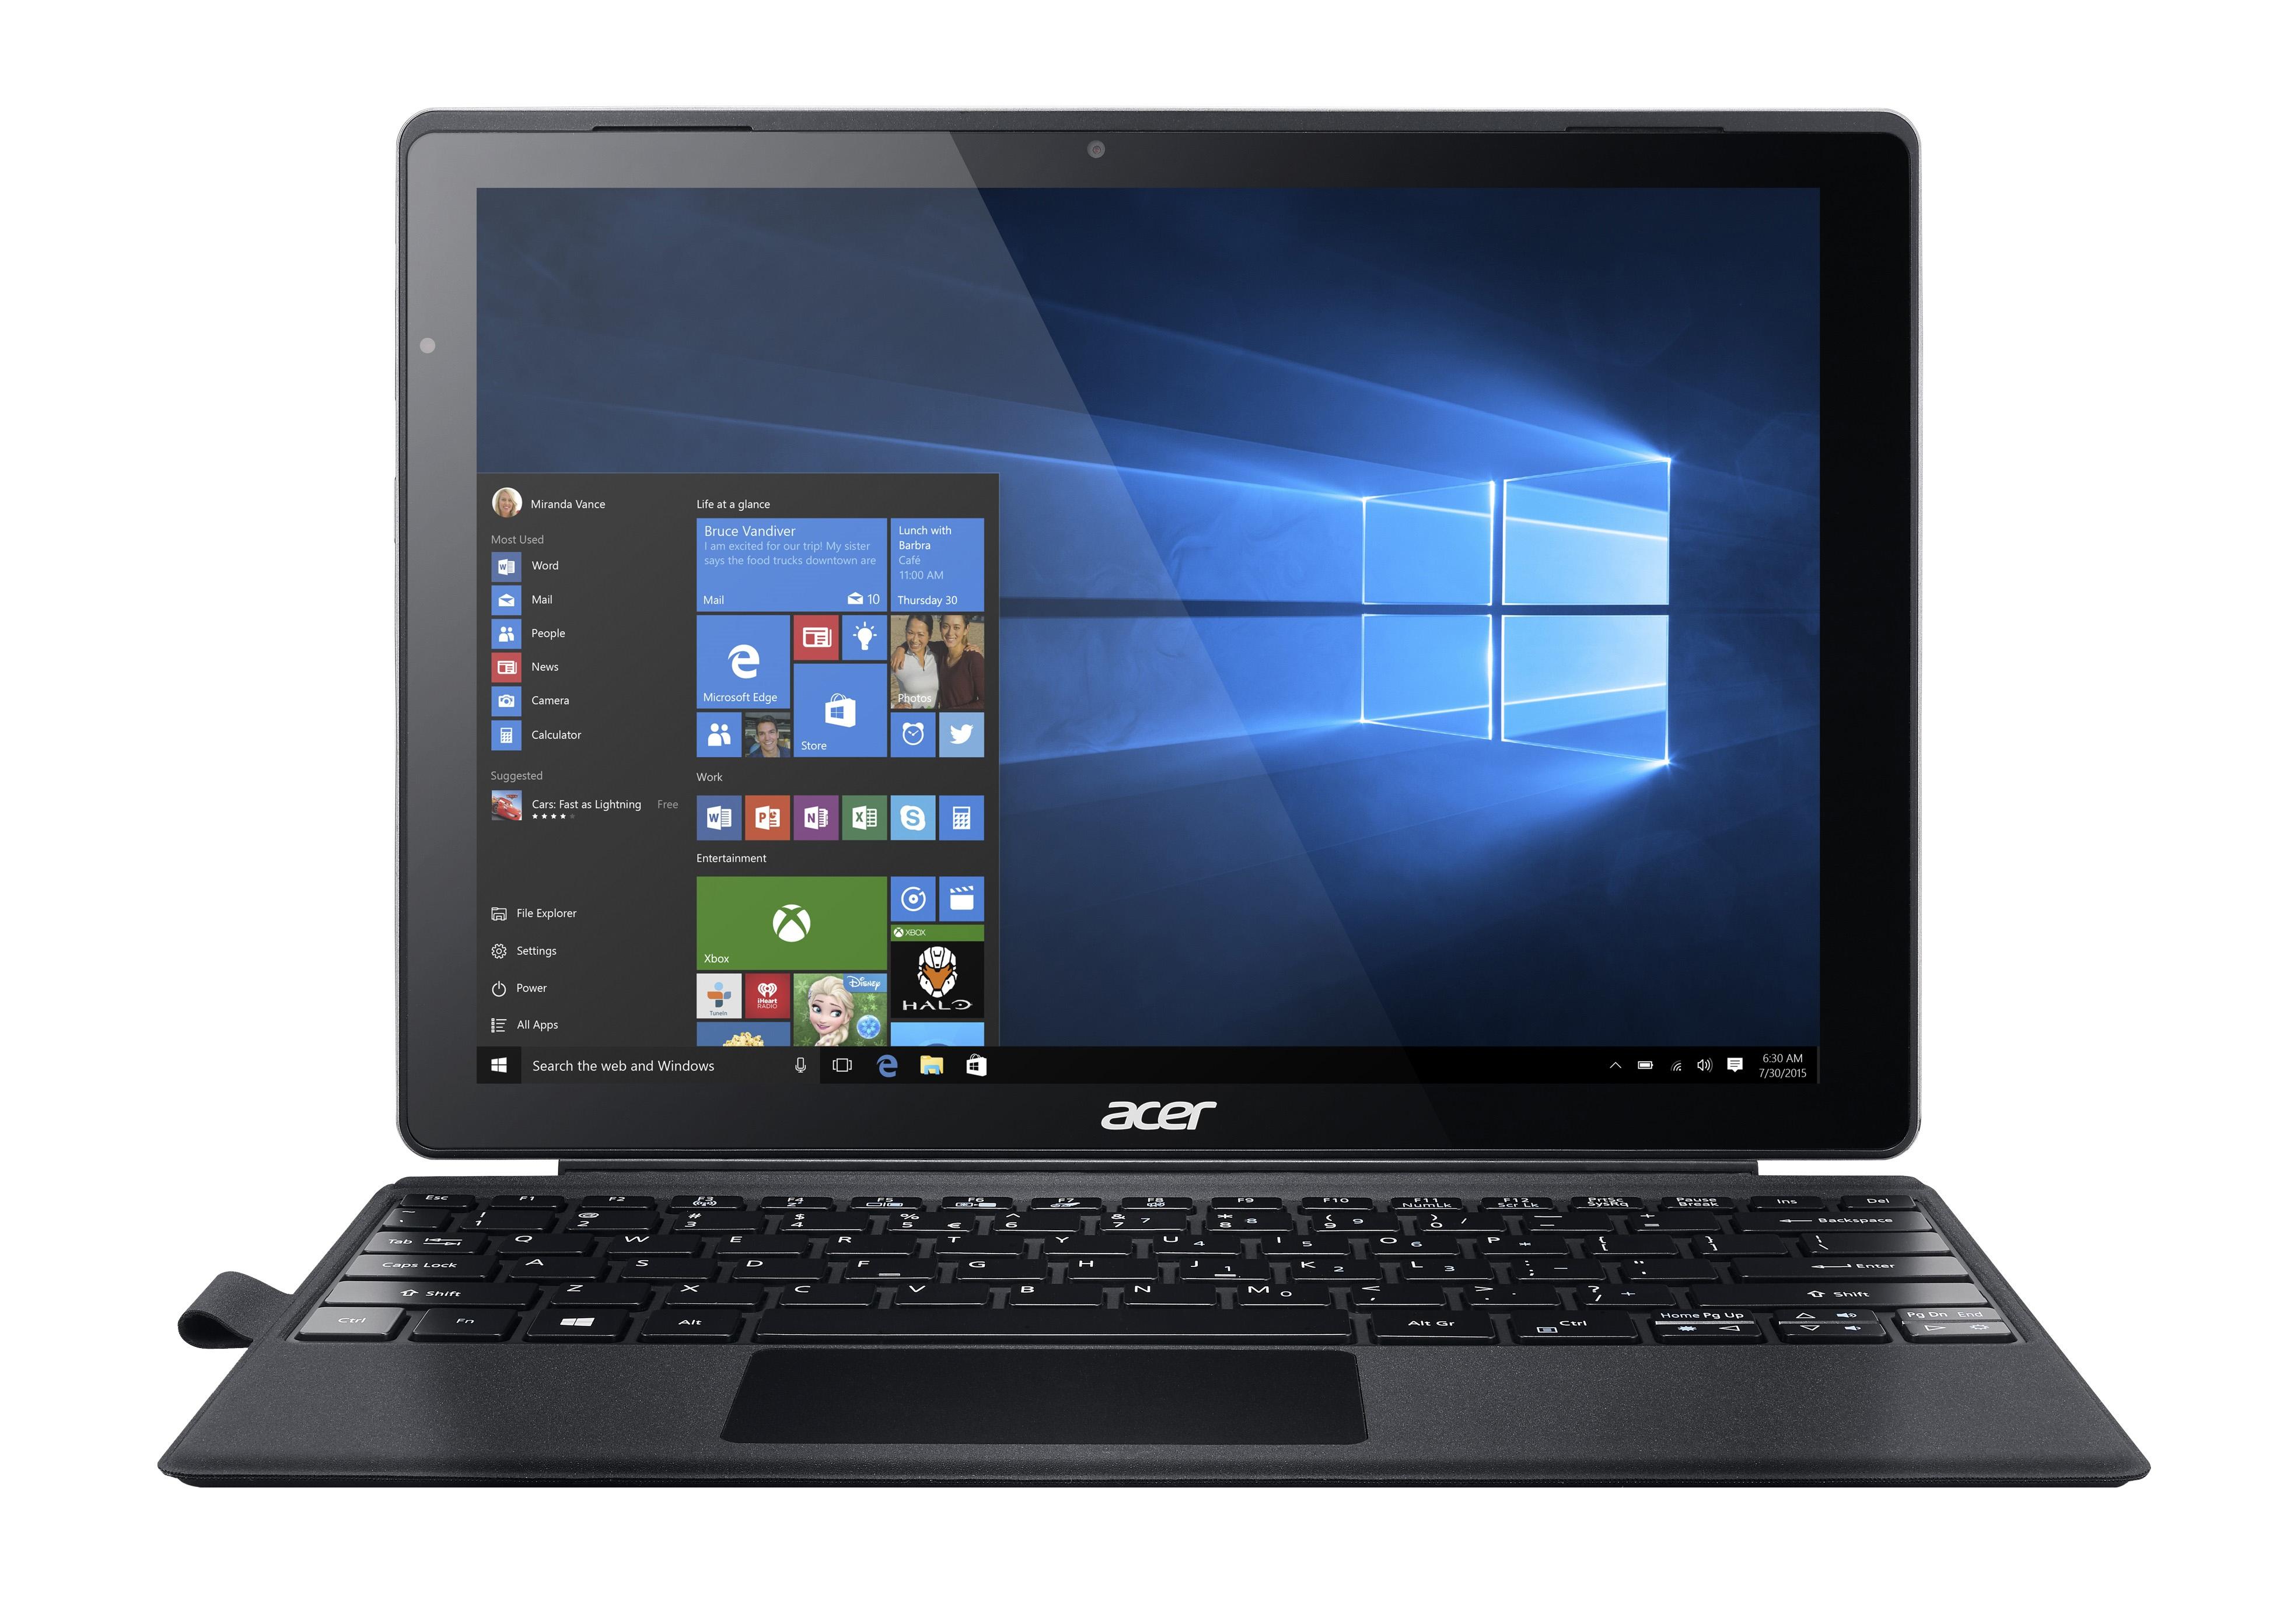 ACER Switch Alpha 12 SA5-271P-77ST Silver Core i7-6500U 30,5cm 12Zoll IPS QHD Touch 8GB 512GB SSD Intel HD 520 Win10 PRO inkl. Keyb.